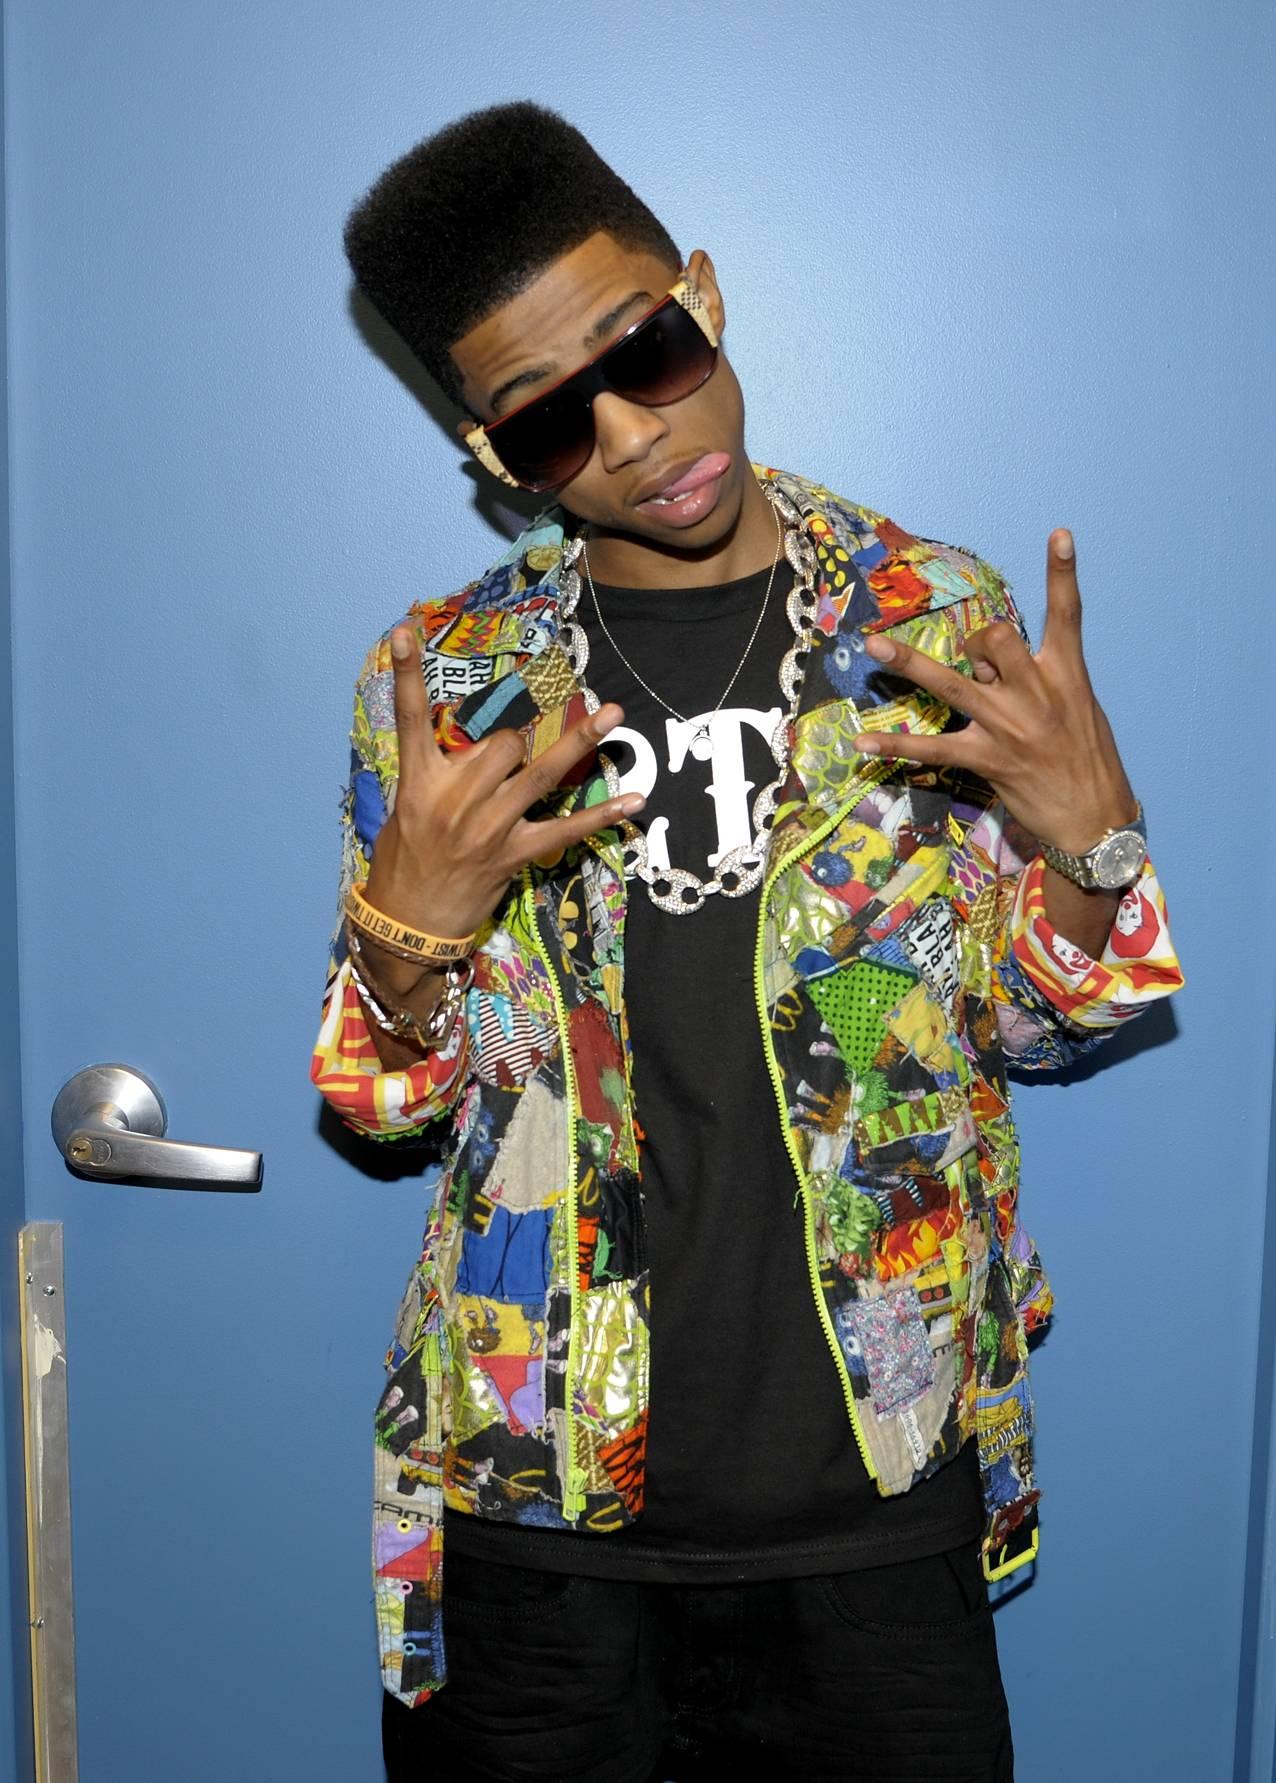 Swag - Lil Twist backstage at 106 & Park, January 05, 2012. (Photo: John Ricard/BET)